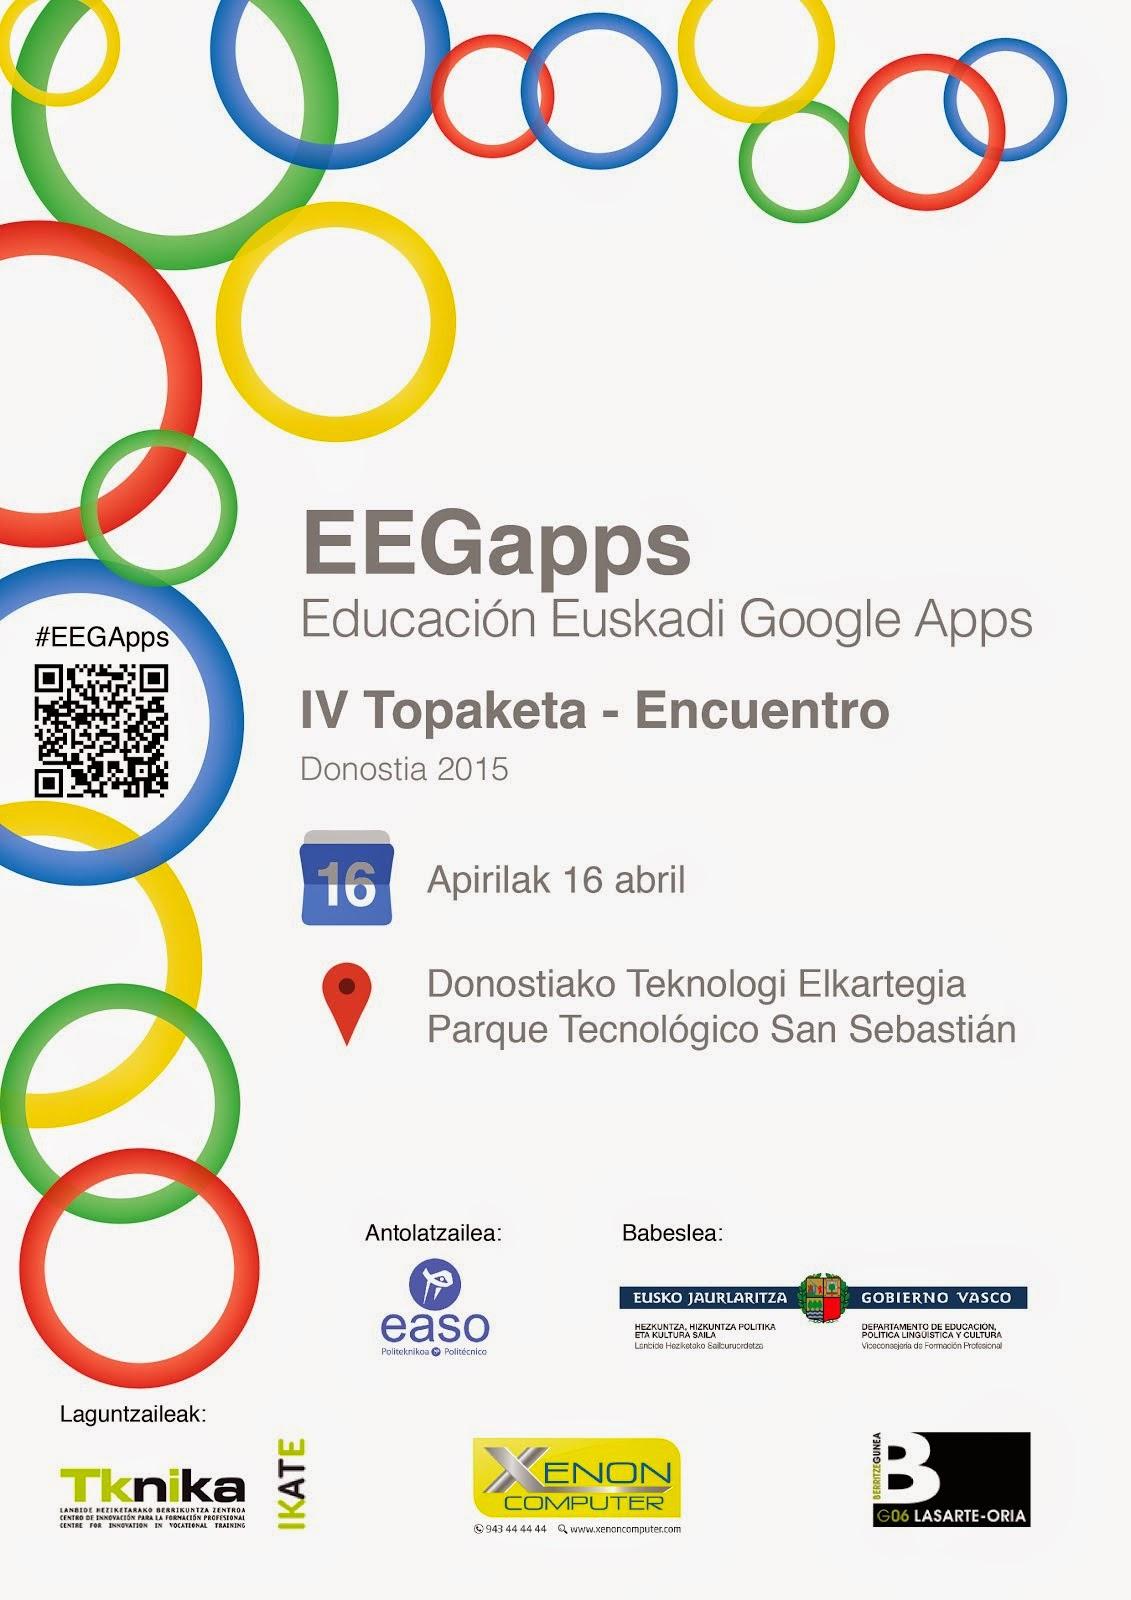 IV Encuentro EEGApps IV Topaketa 2015